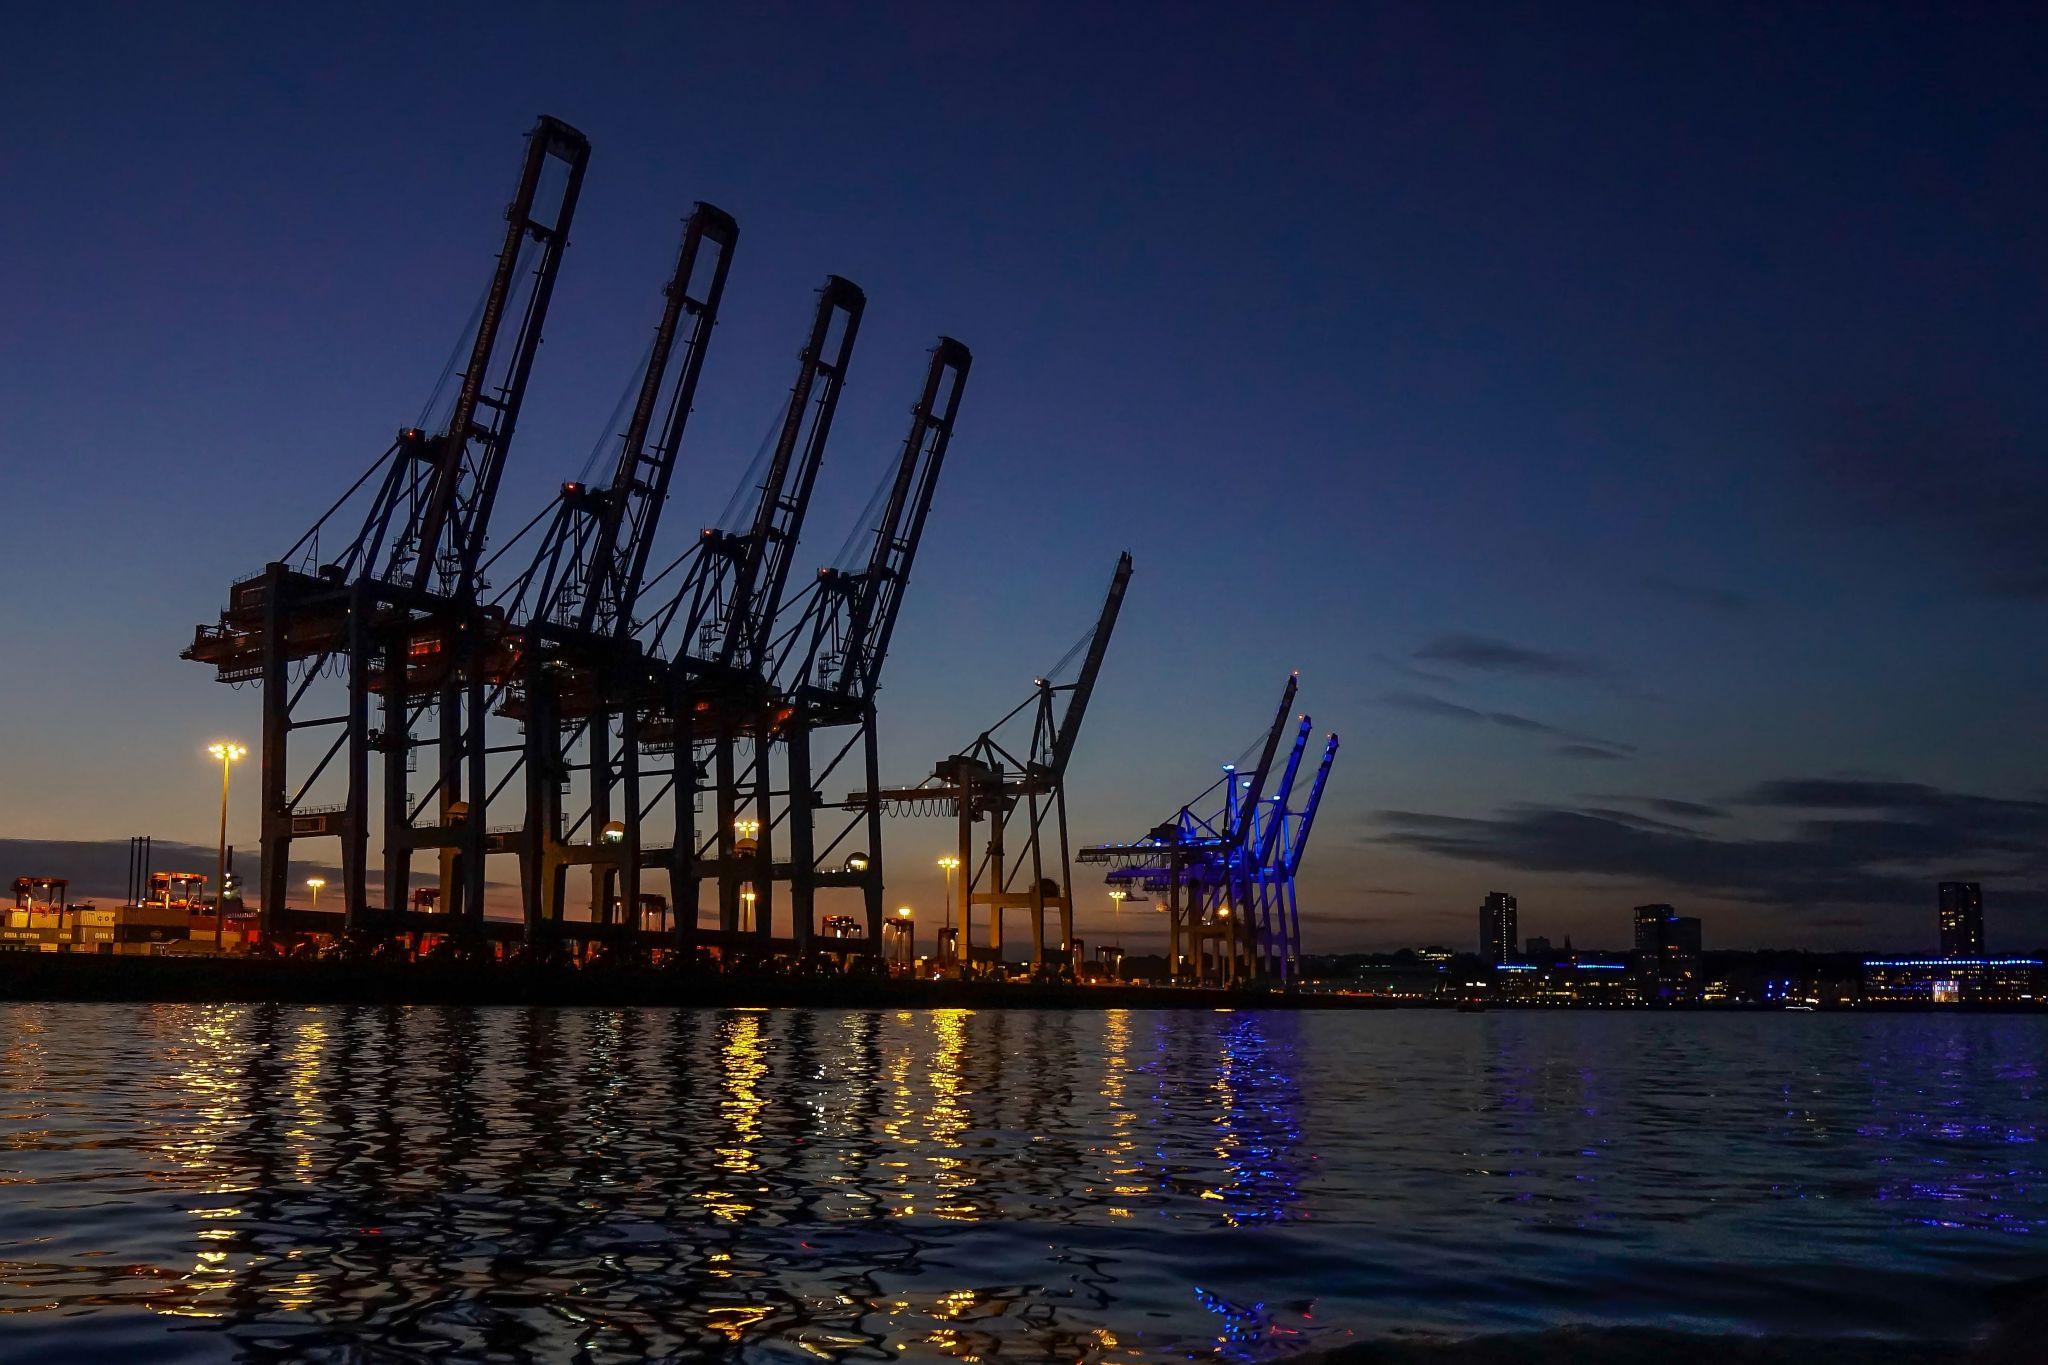 Hamburg Containerterminal Tollerort, Germany